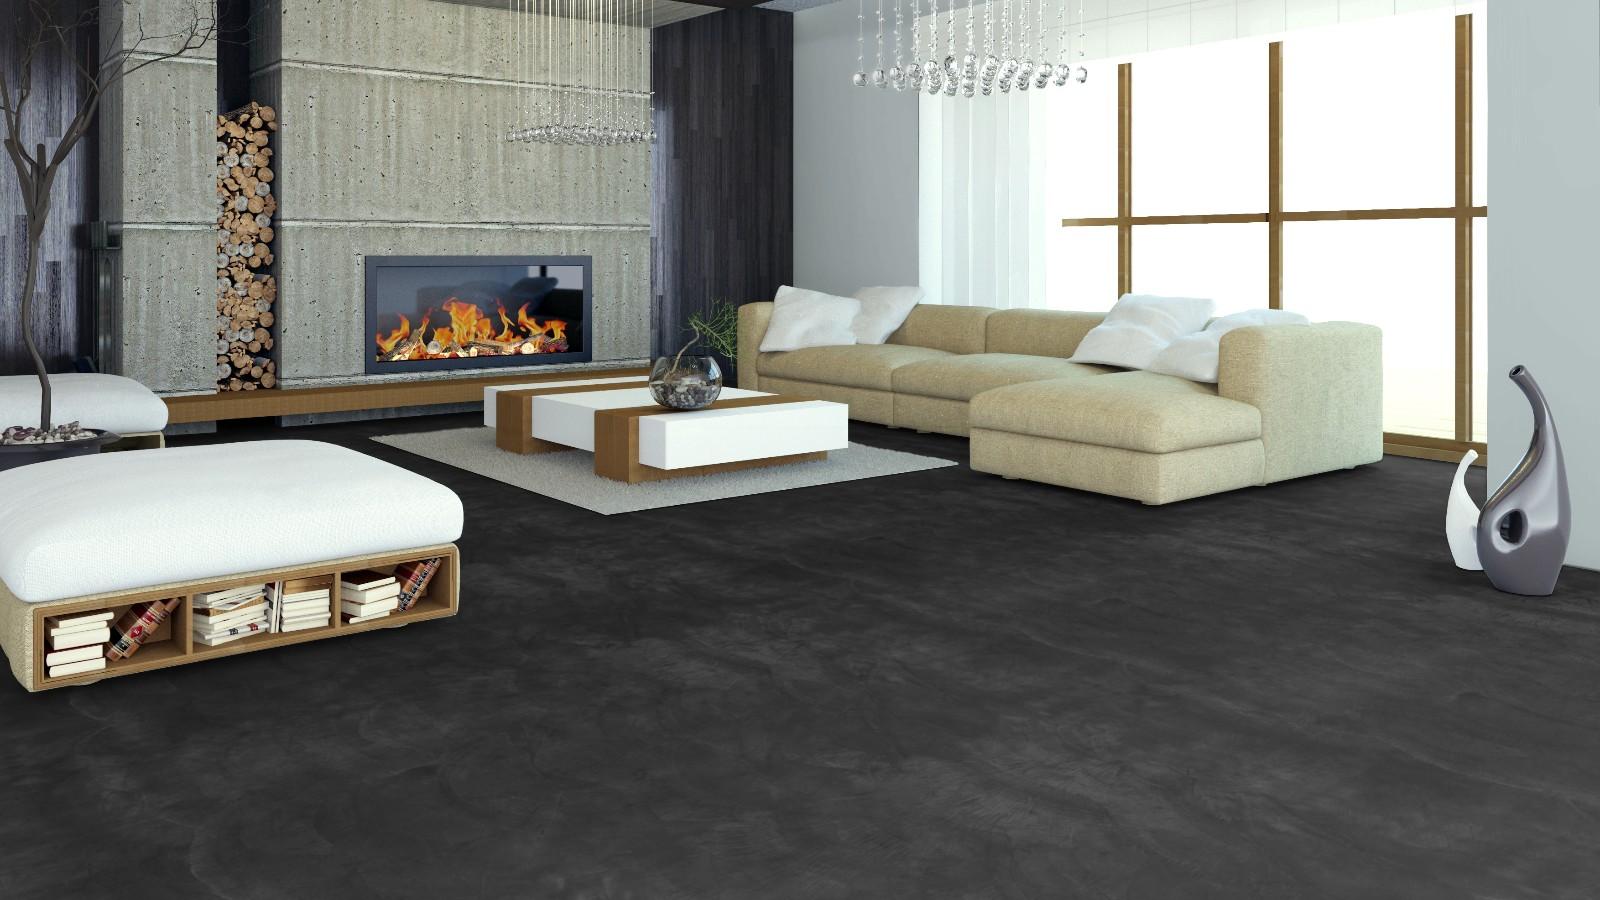 huis muur beton cire vloer. Black Bedroom Furniture Sets. Home Design Ideas